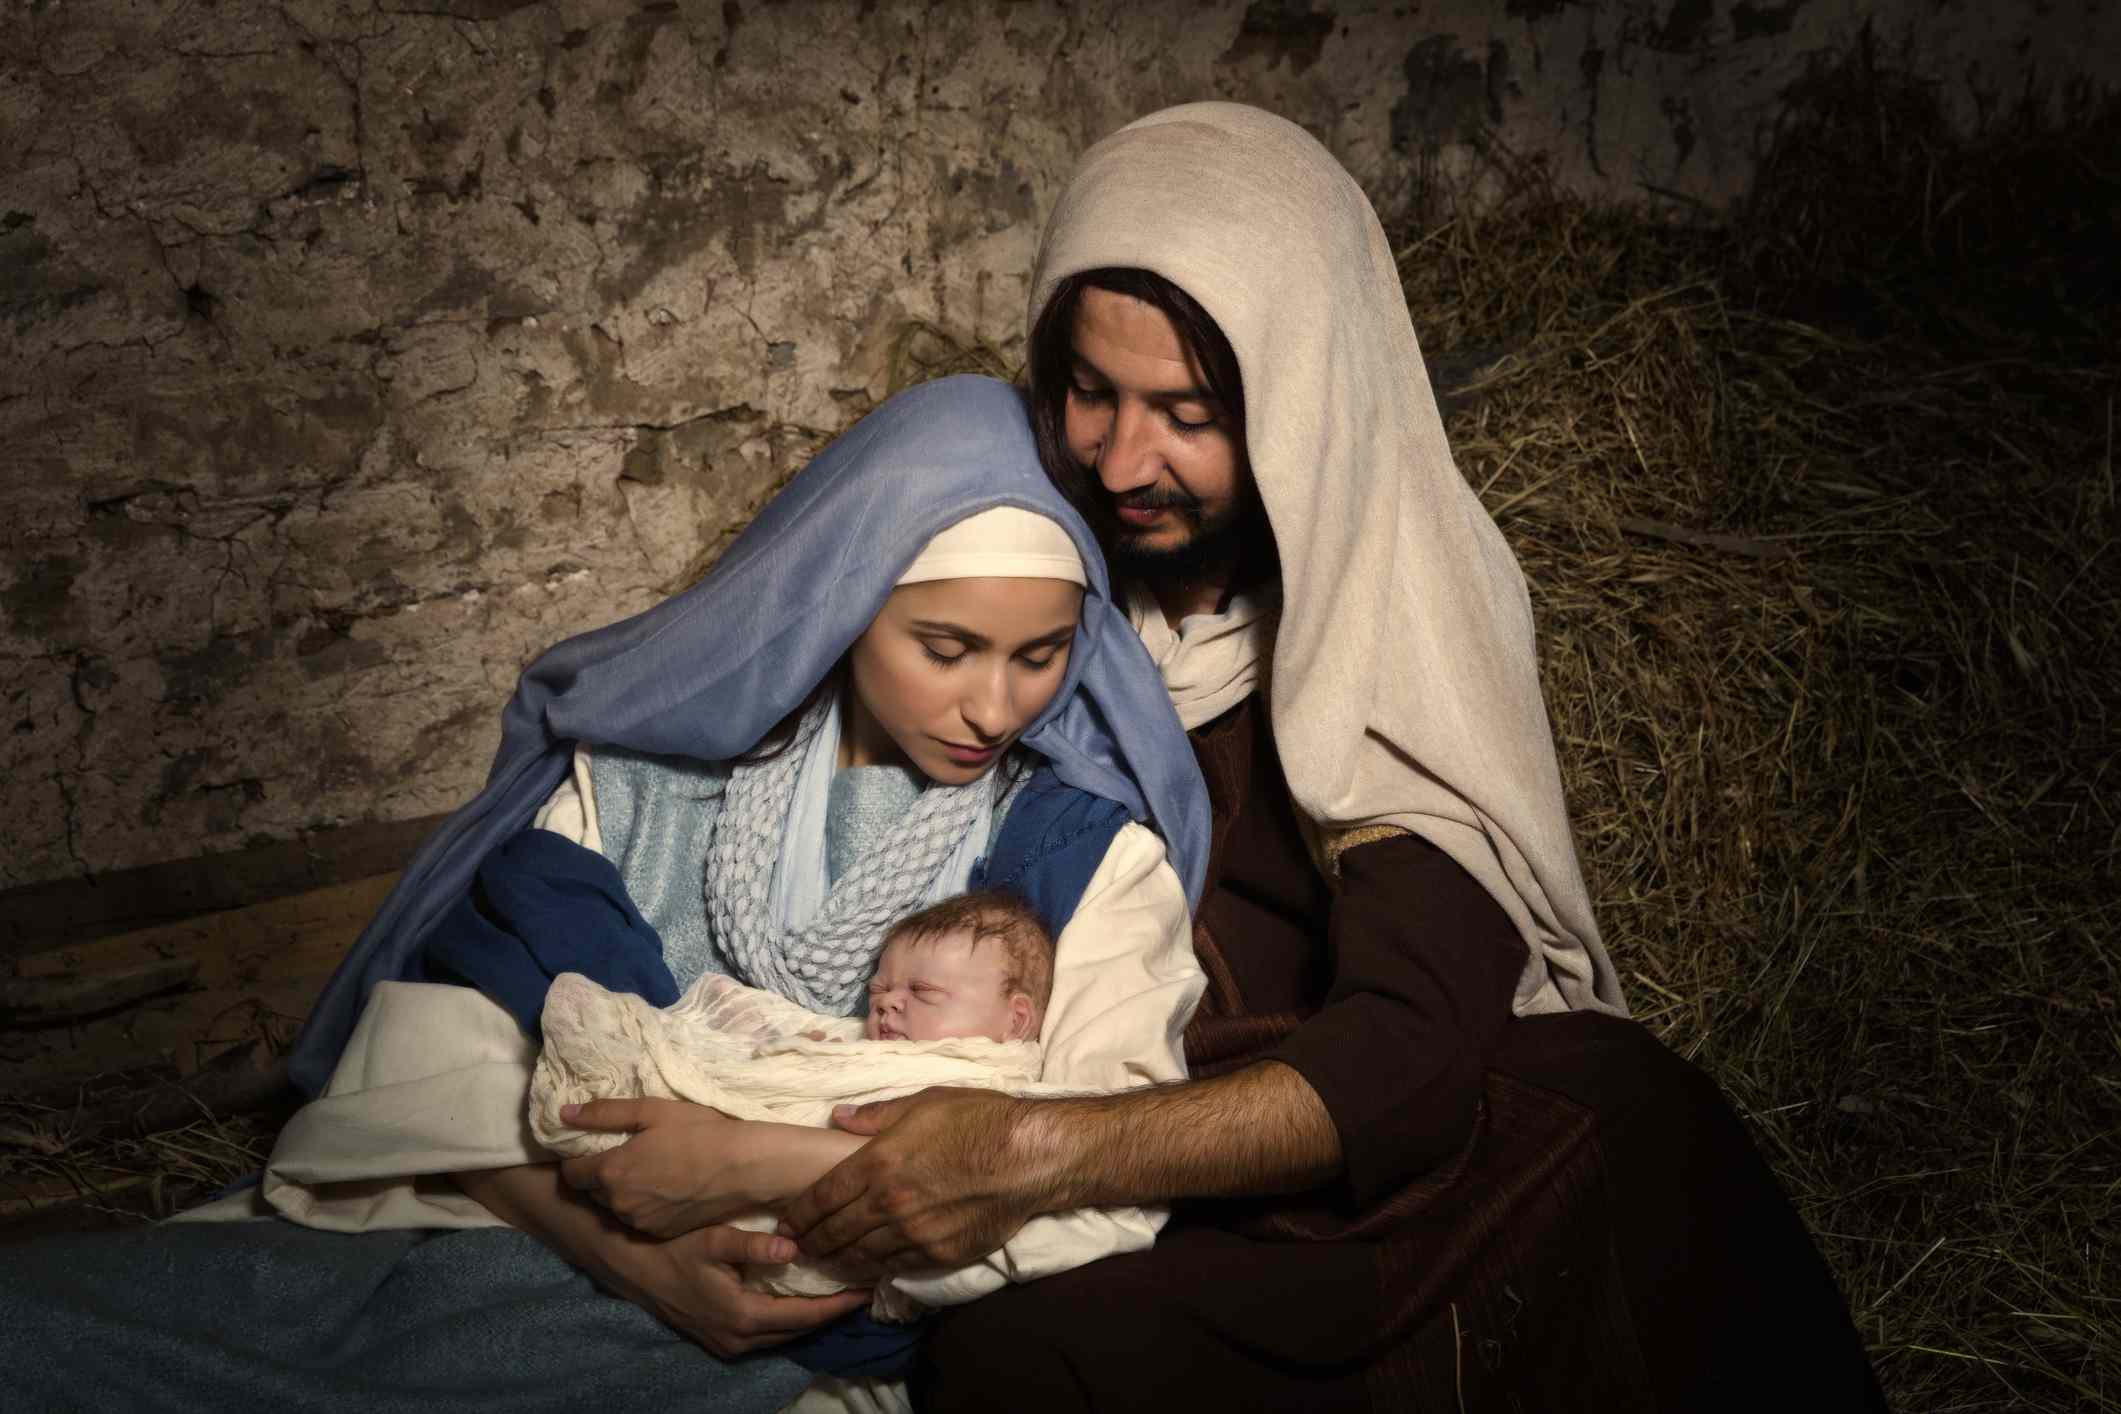 Mary, Joseph and Baby Jesus in nativity scene